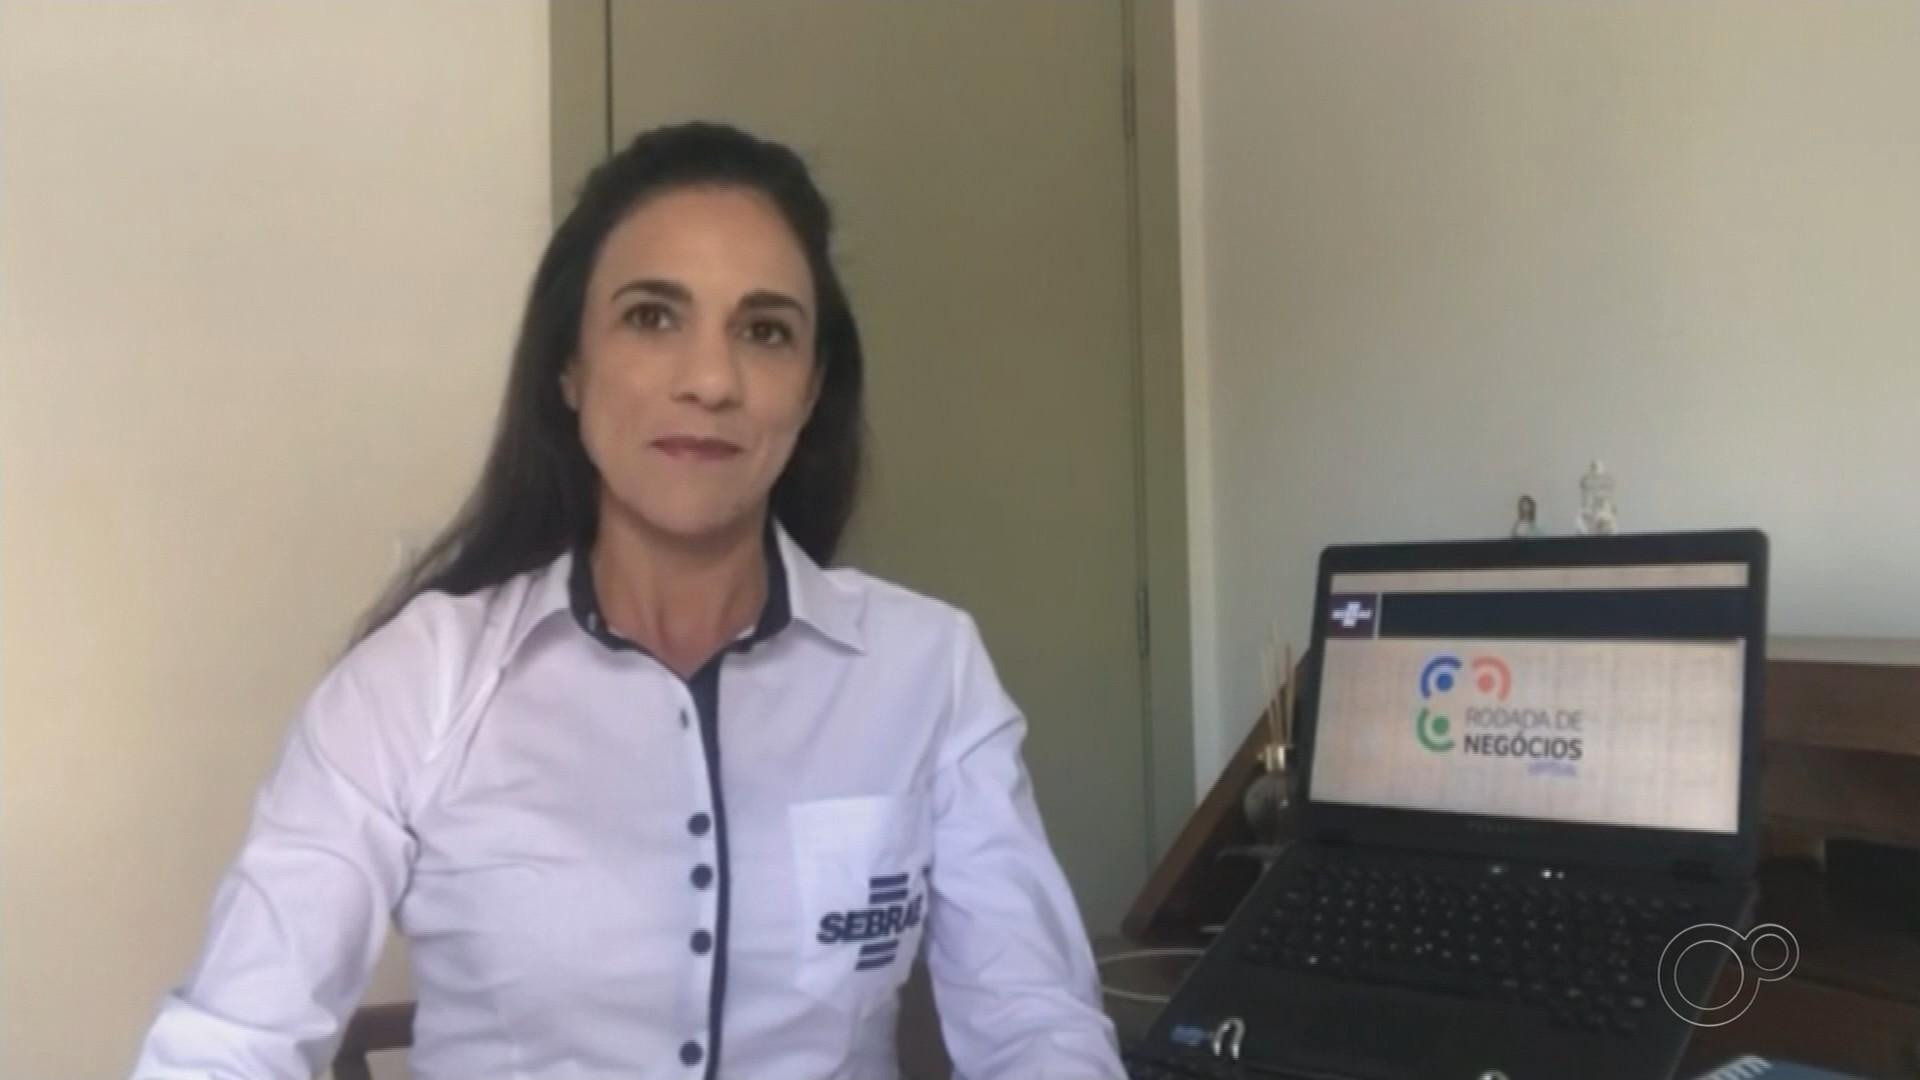 VÍDEOS: Bom Dia Cidade de Rio Preto e Araçatuba desta sexta-feira, 29 de maio